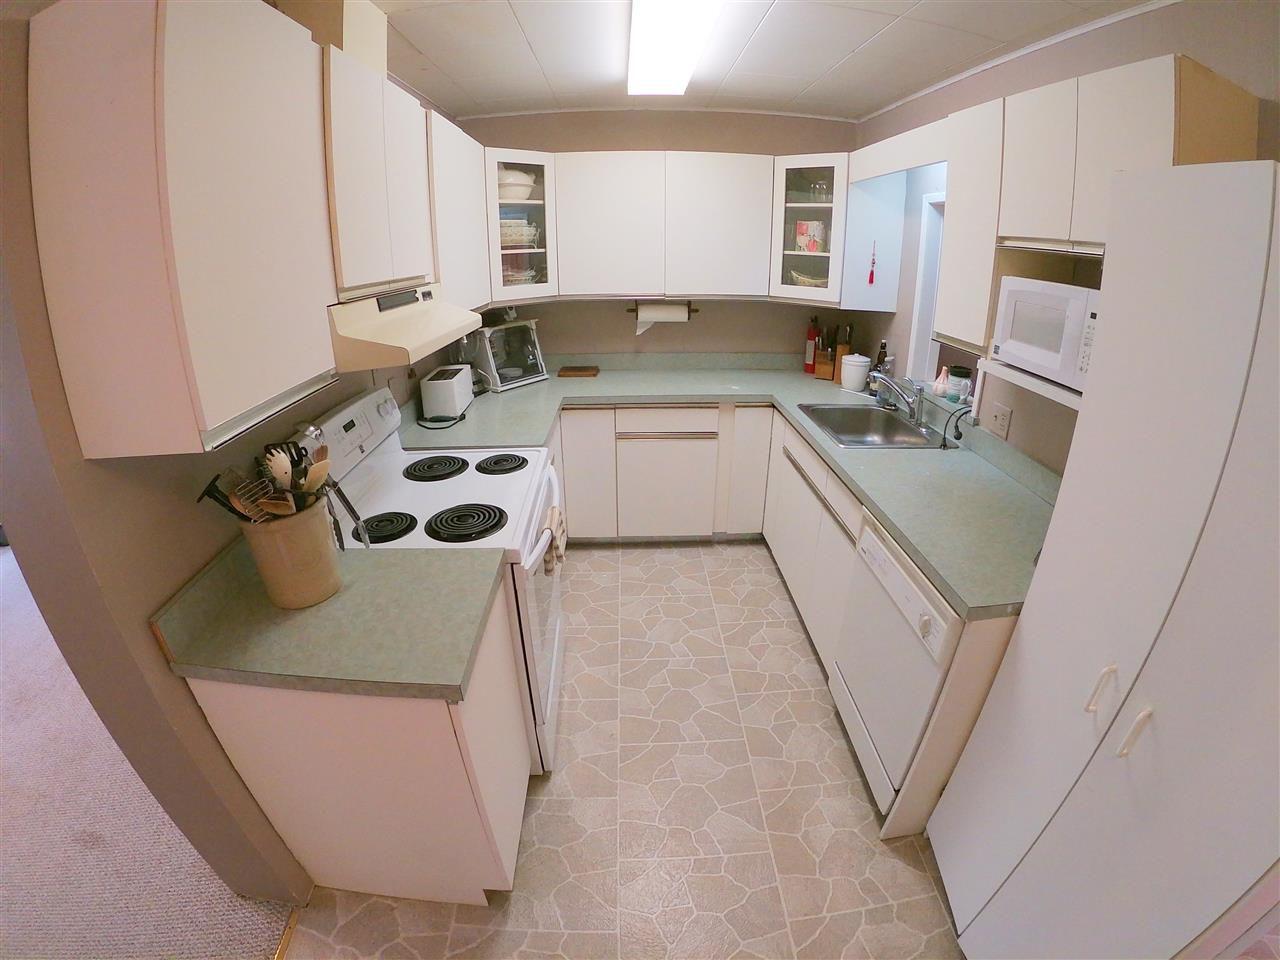 Photo 15: Photos: 5702 MEDUSA Street in Sechelt: Sechelt District House for sale (Sunshine Coast)  : MLS®# R2323721